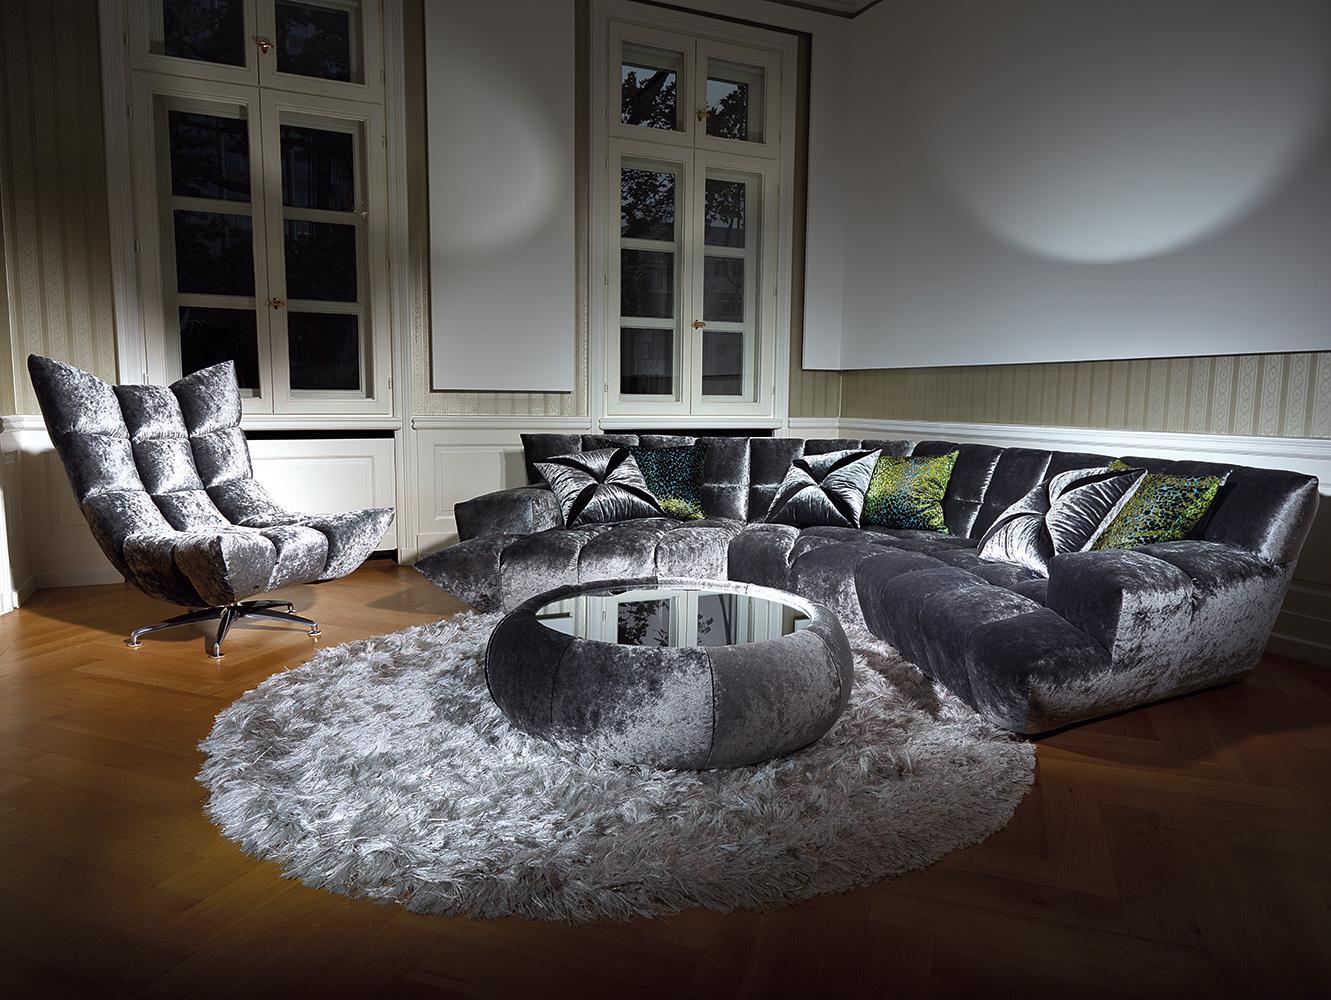 Full Size of Rundes Sofa Bilder Ideen Couch Landhaus Schlafsofa Liegefläche 160x200 Muuto Abnehmbarer Bezug Koinor 2 5 Sitzer Chesterfield Gebraucht Cognac Recamiere Sofa Rundes Sofa